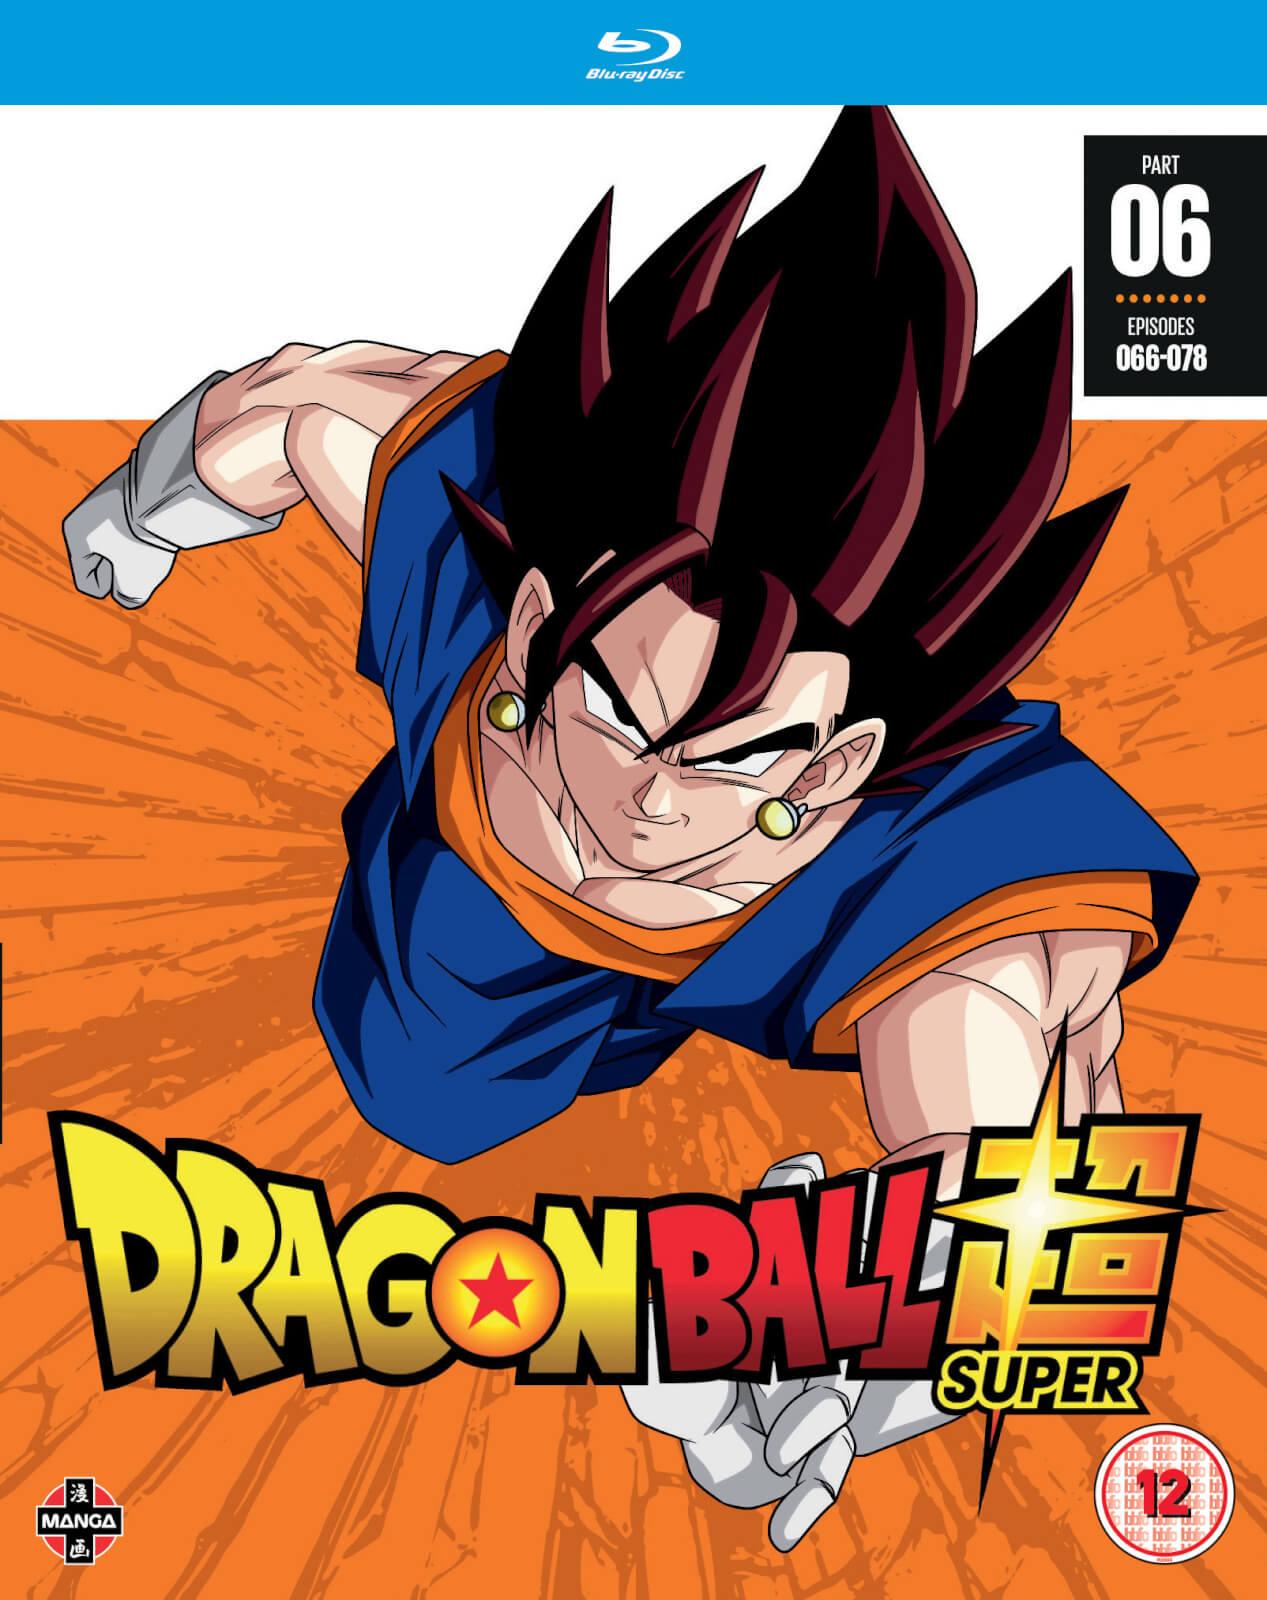 dragon ball super 6  Dragon Ball Super Part 6 (Episodes 66-78) Blu-ray | Zavvi